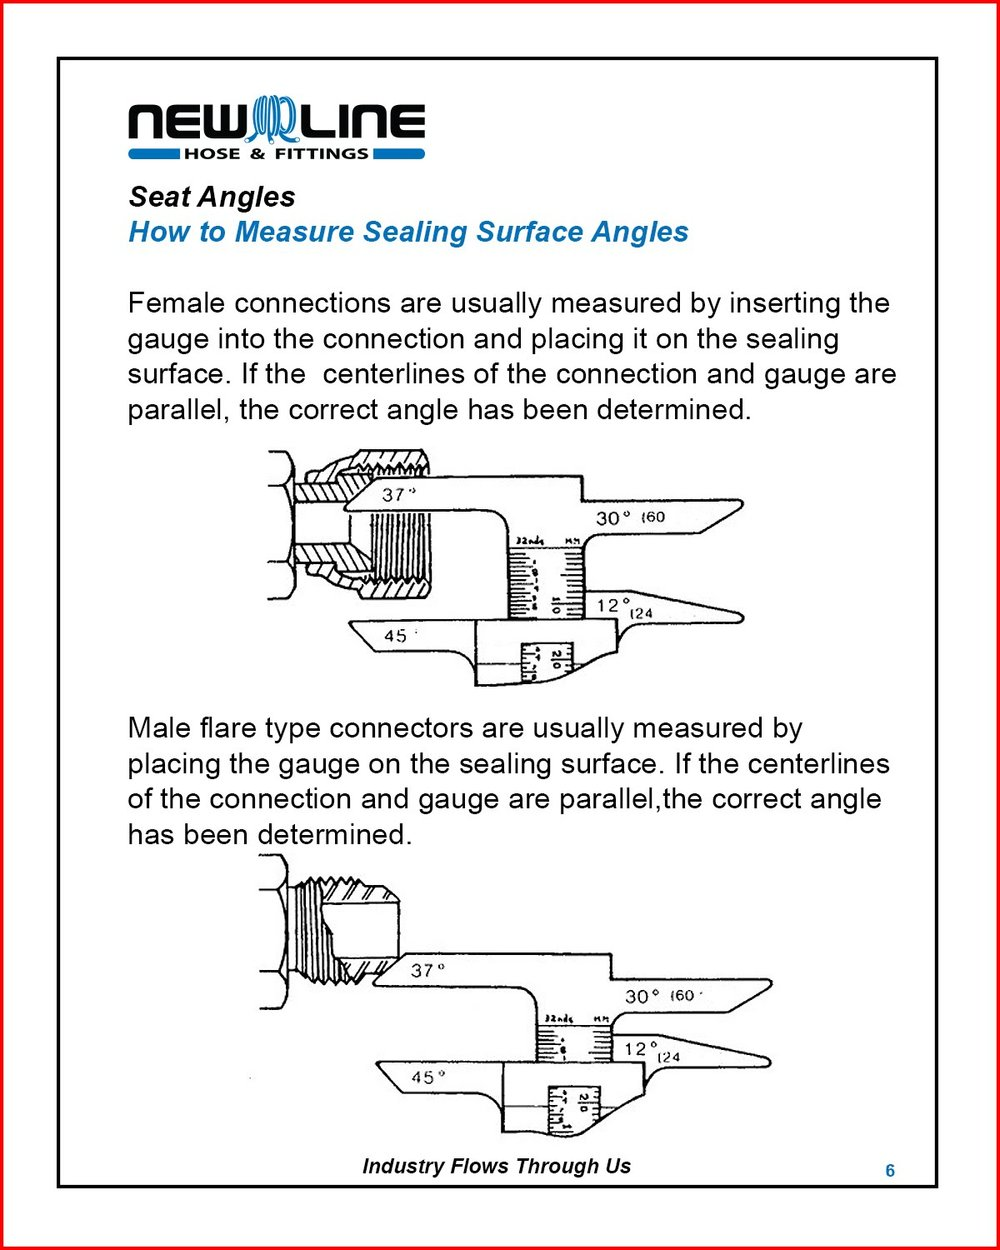 Port-&-Connectors-Booklet-pg-6.jpg